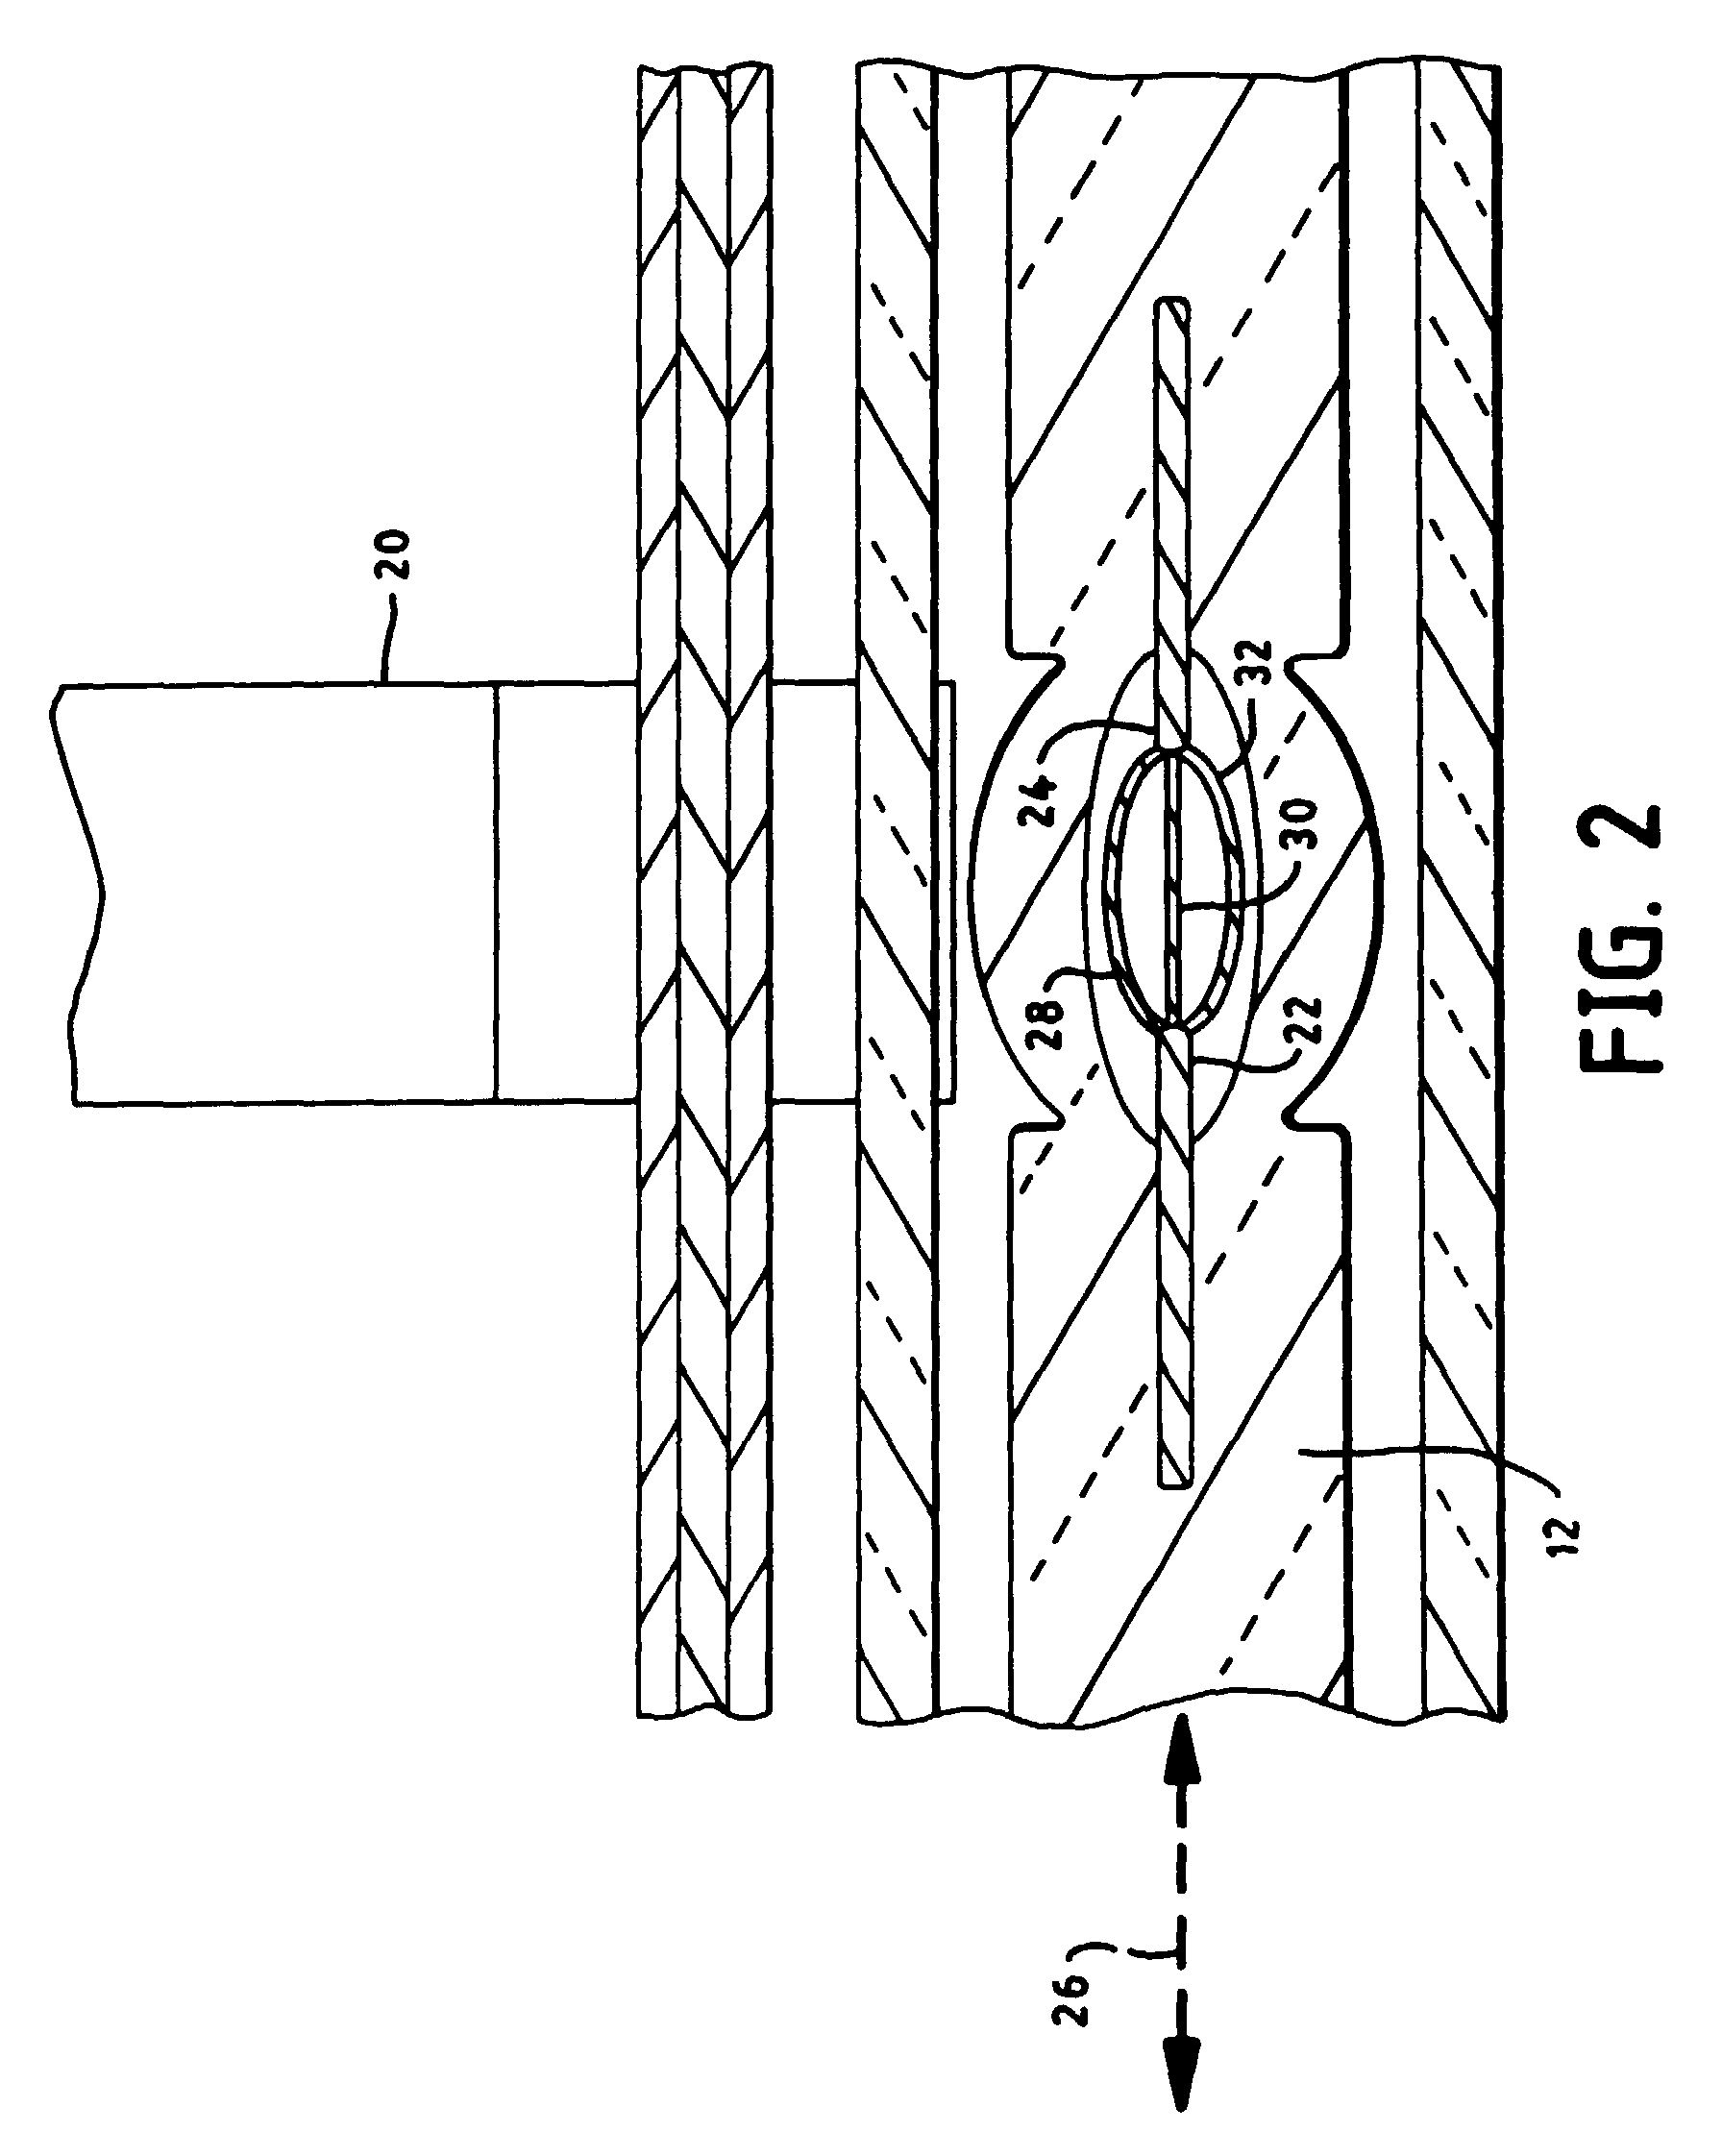 patent ep0940841a2